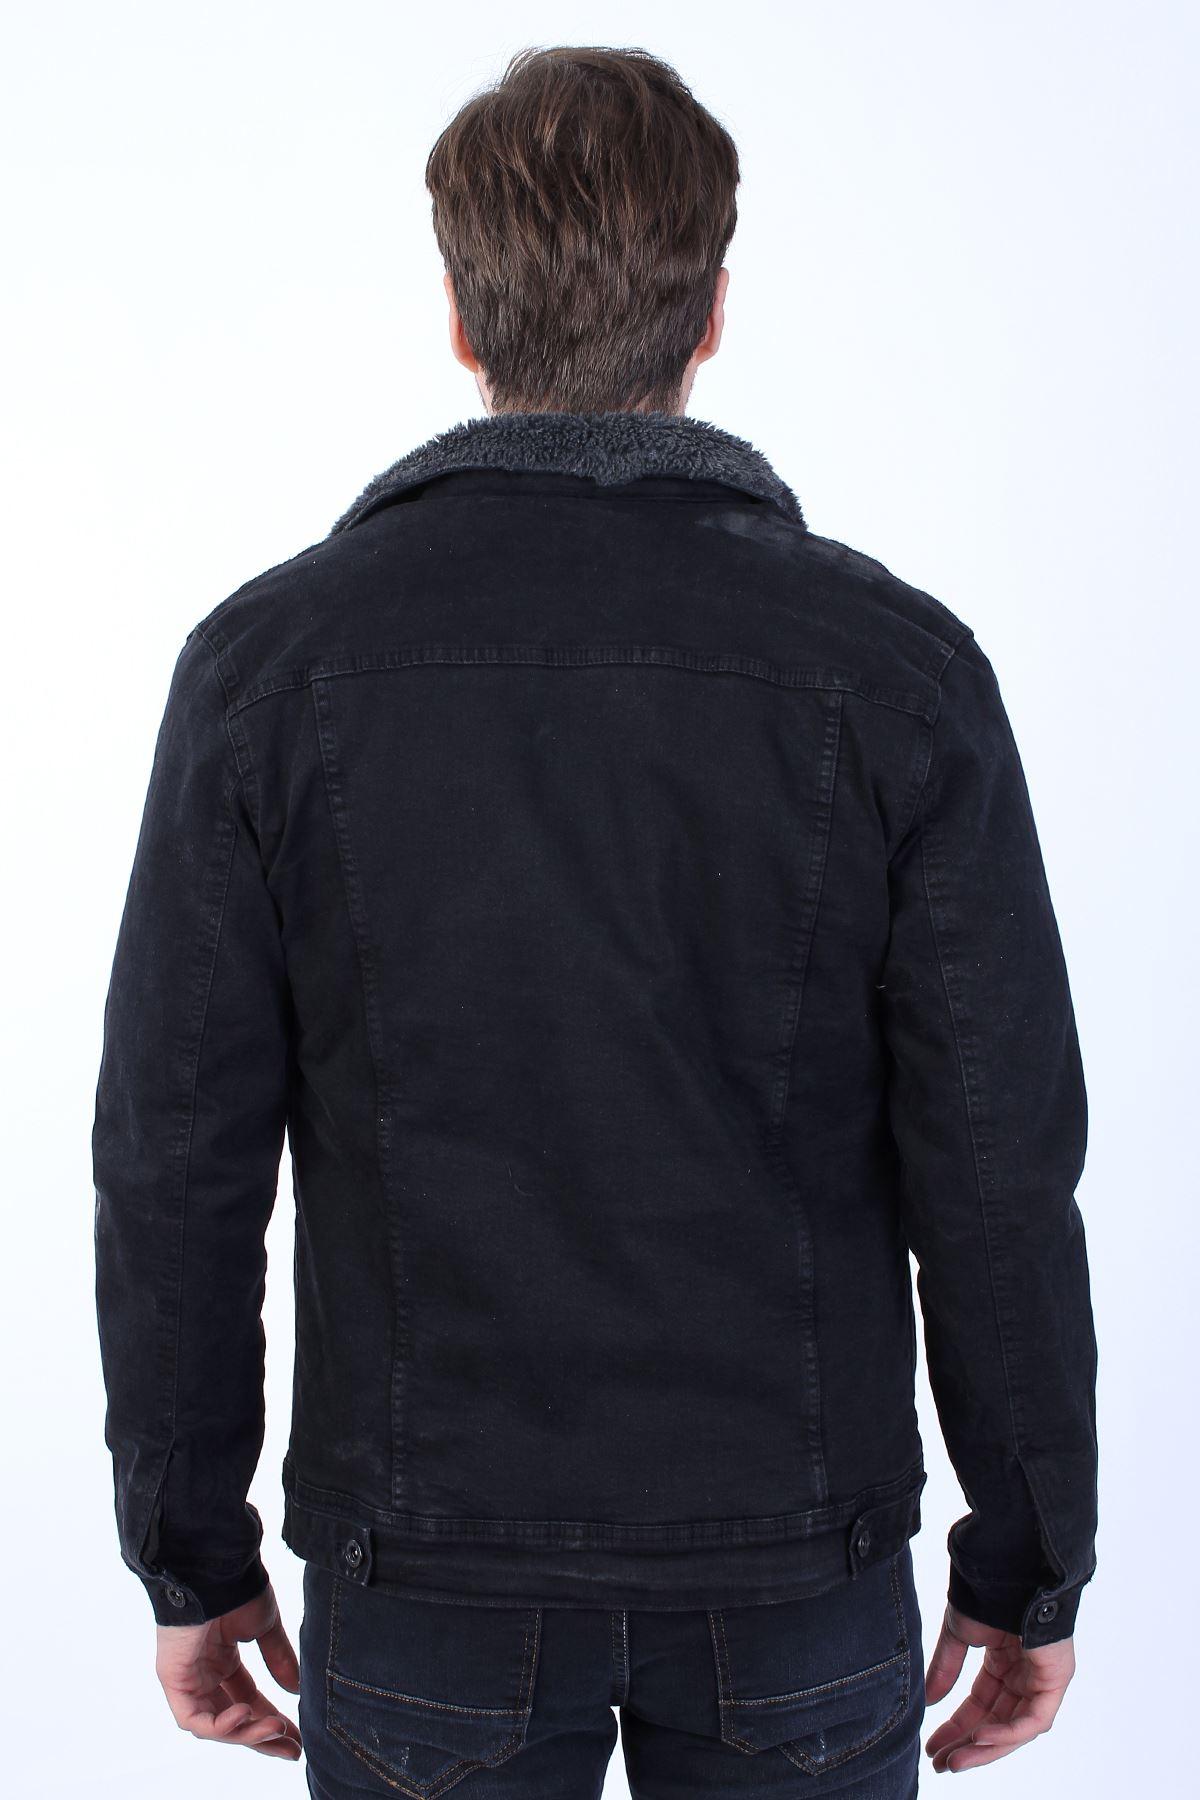 Erkek Antrasit Kürklü Siyah Kot Ceket